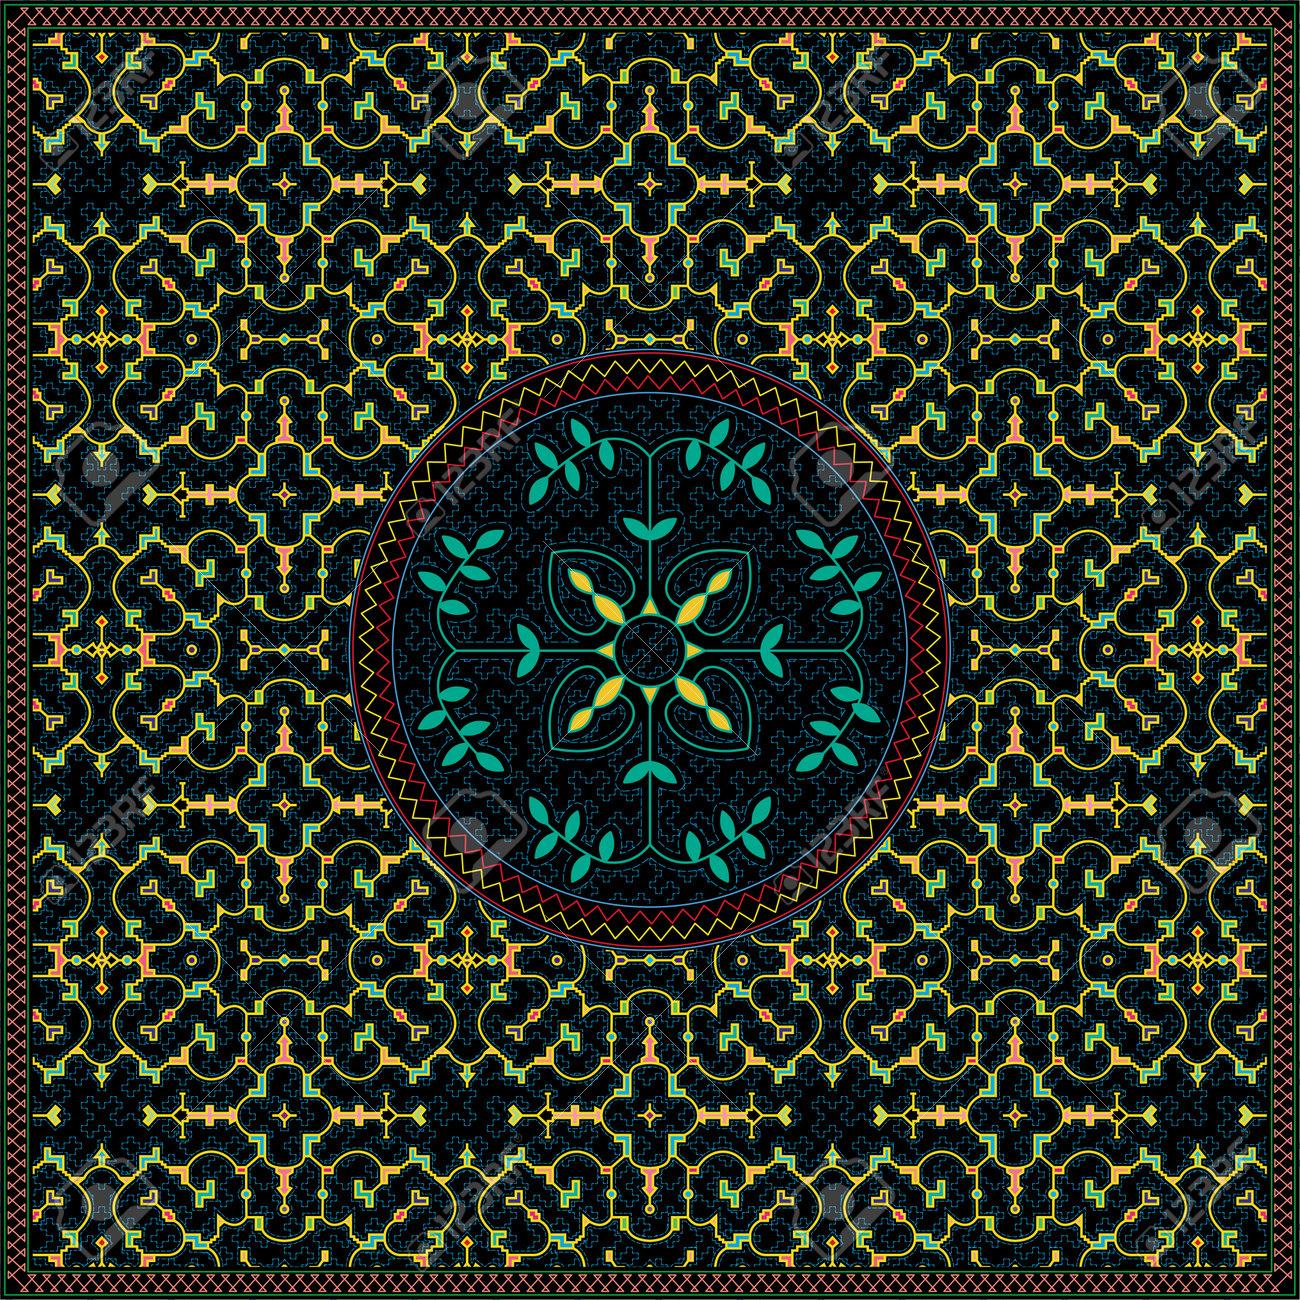 12 of 12 Shipibo Conibo artwork patterns HD set - 160578806